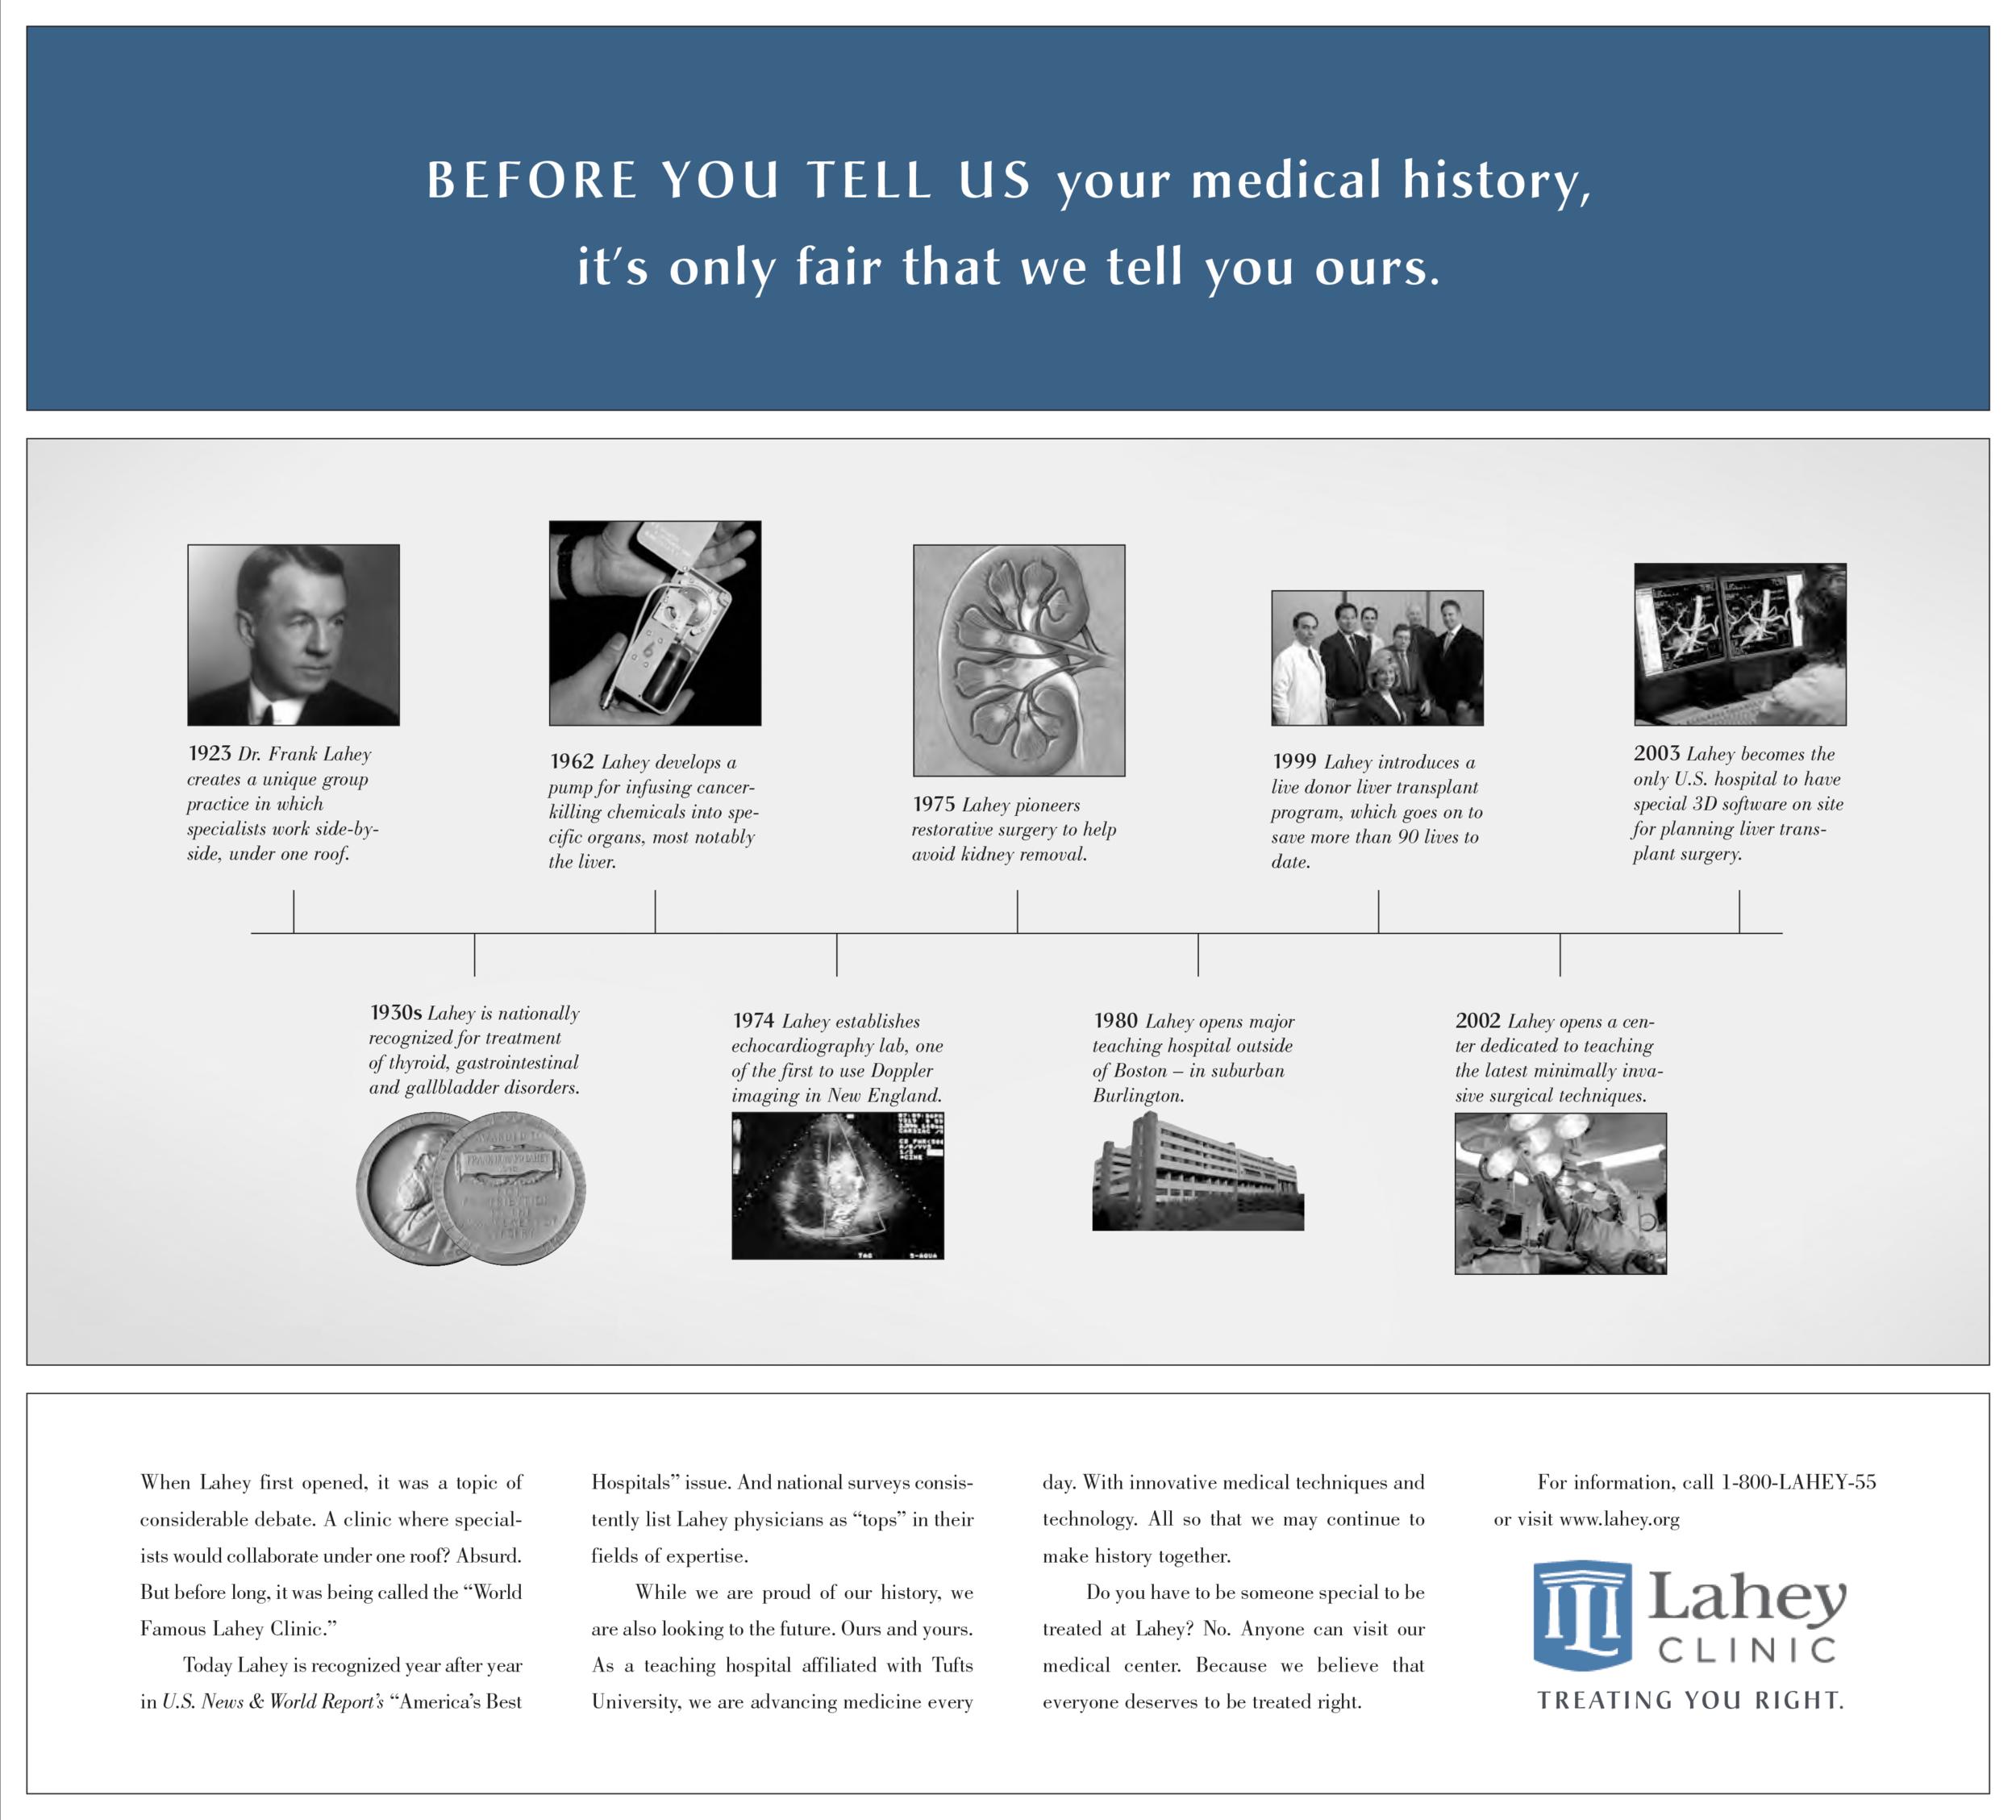 Lahey Bona Fide medical history timeline